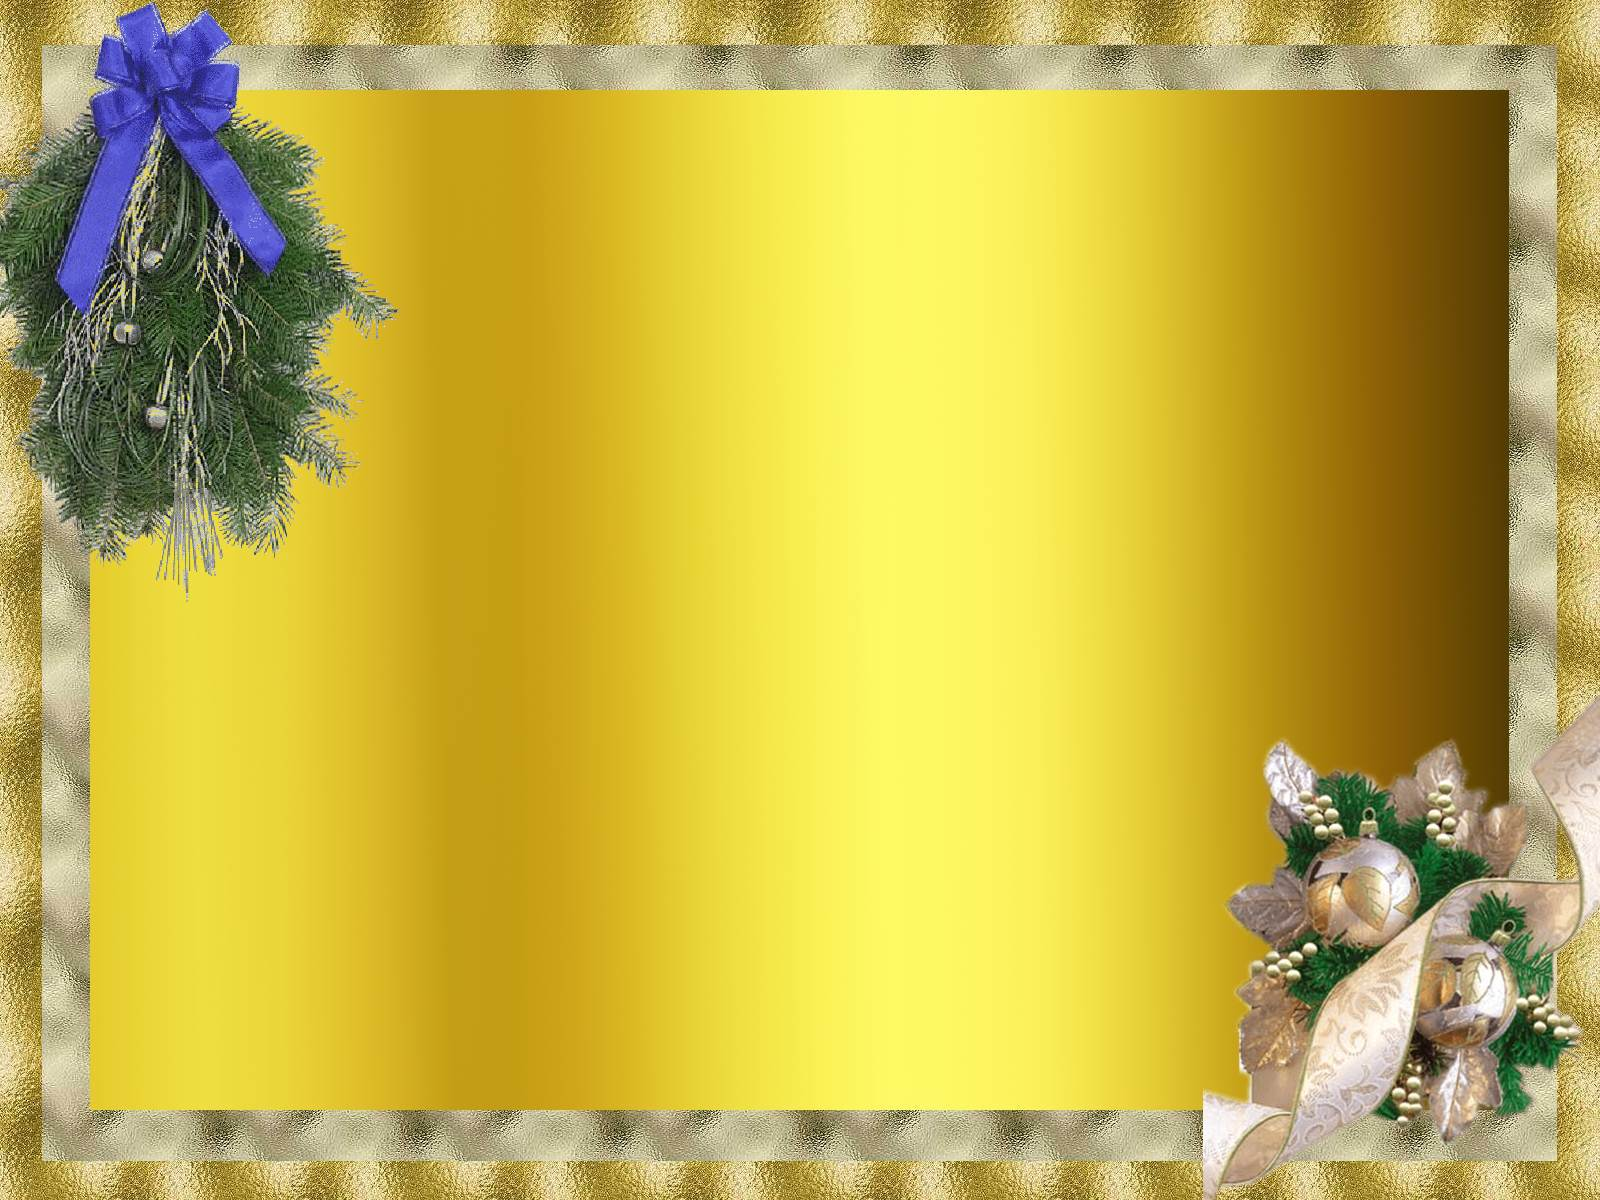 Feliz navidad papa noel - 3 9